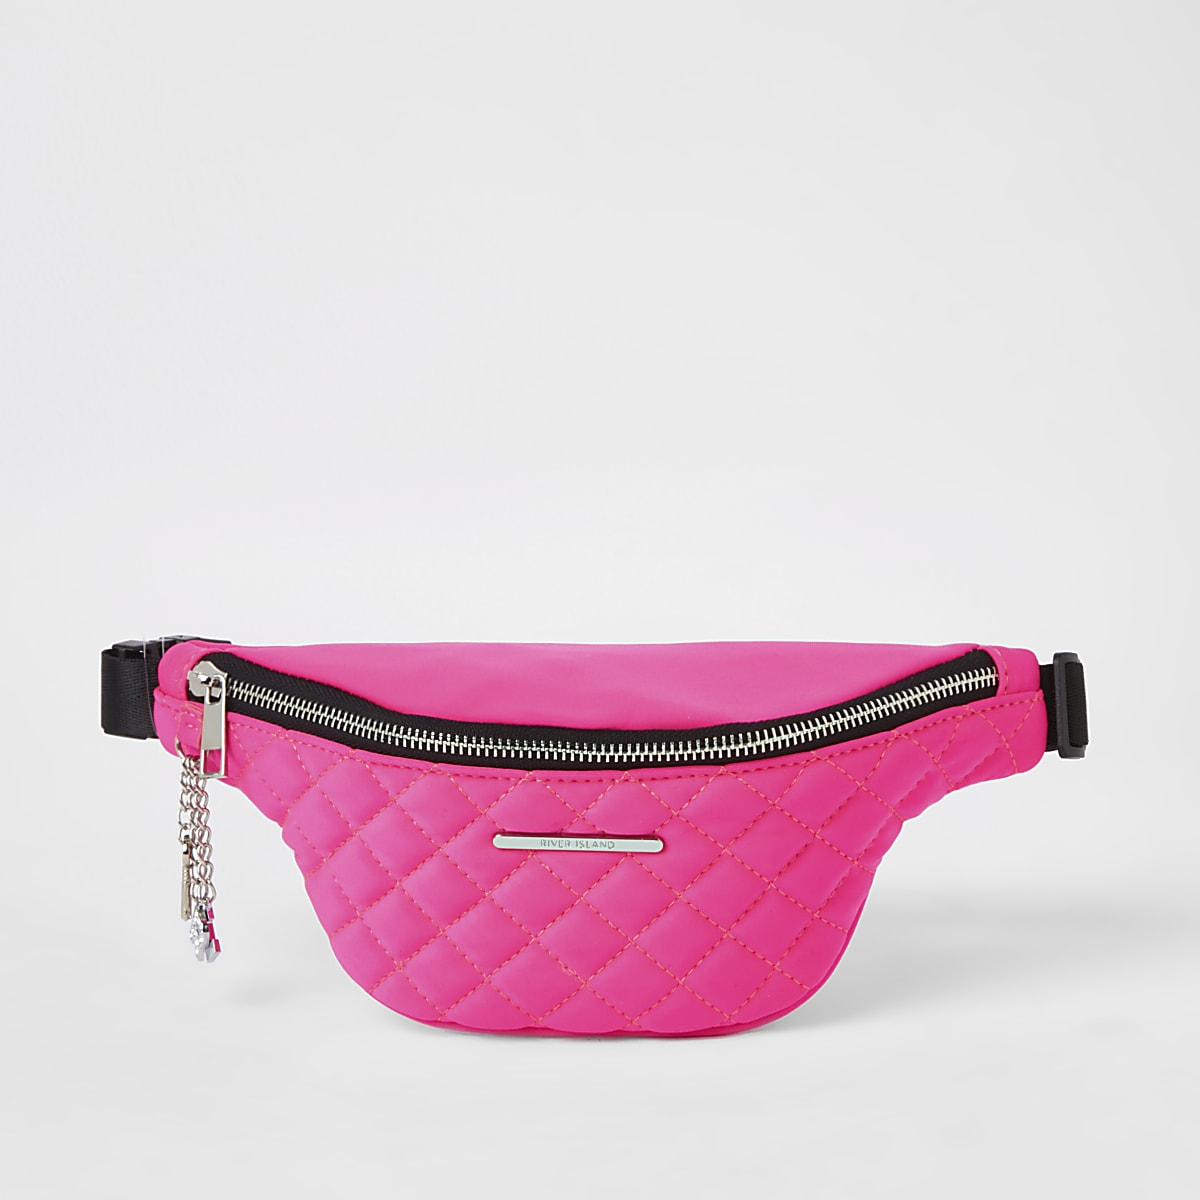 Girls pink quilted fluorescent bum bag